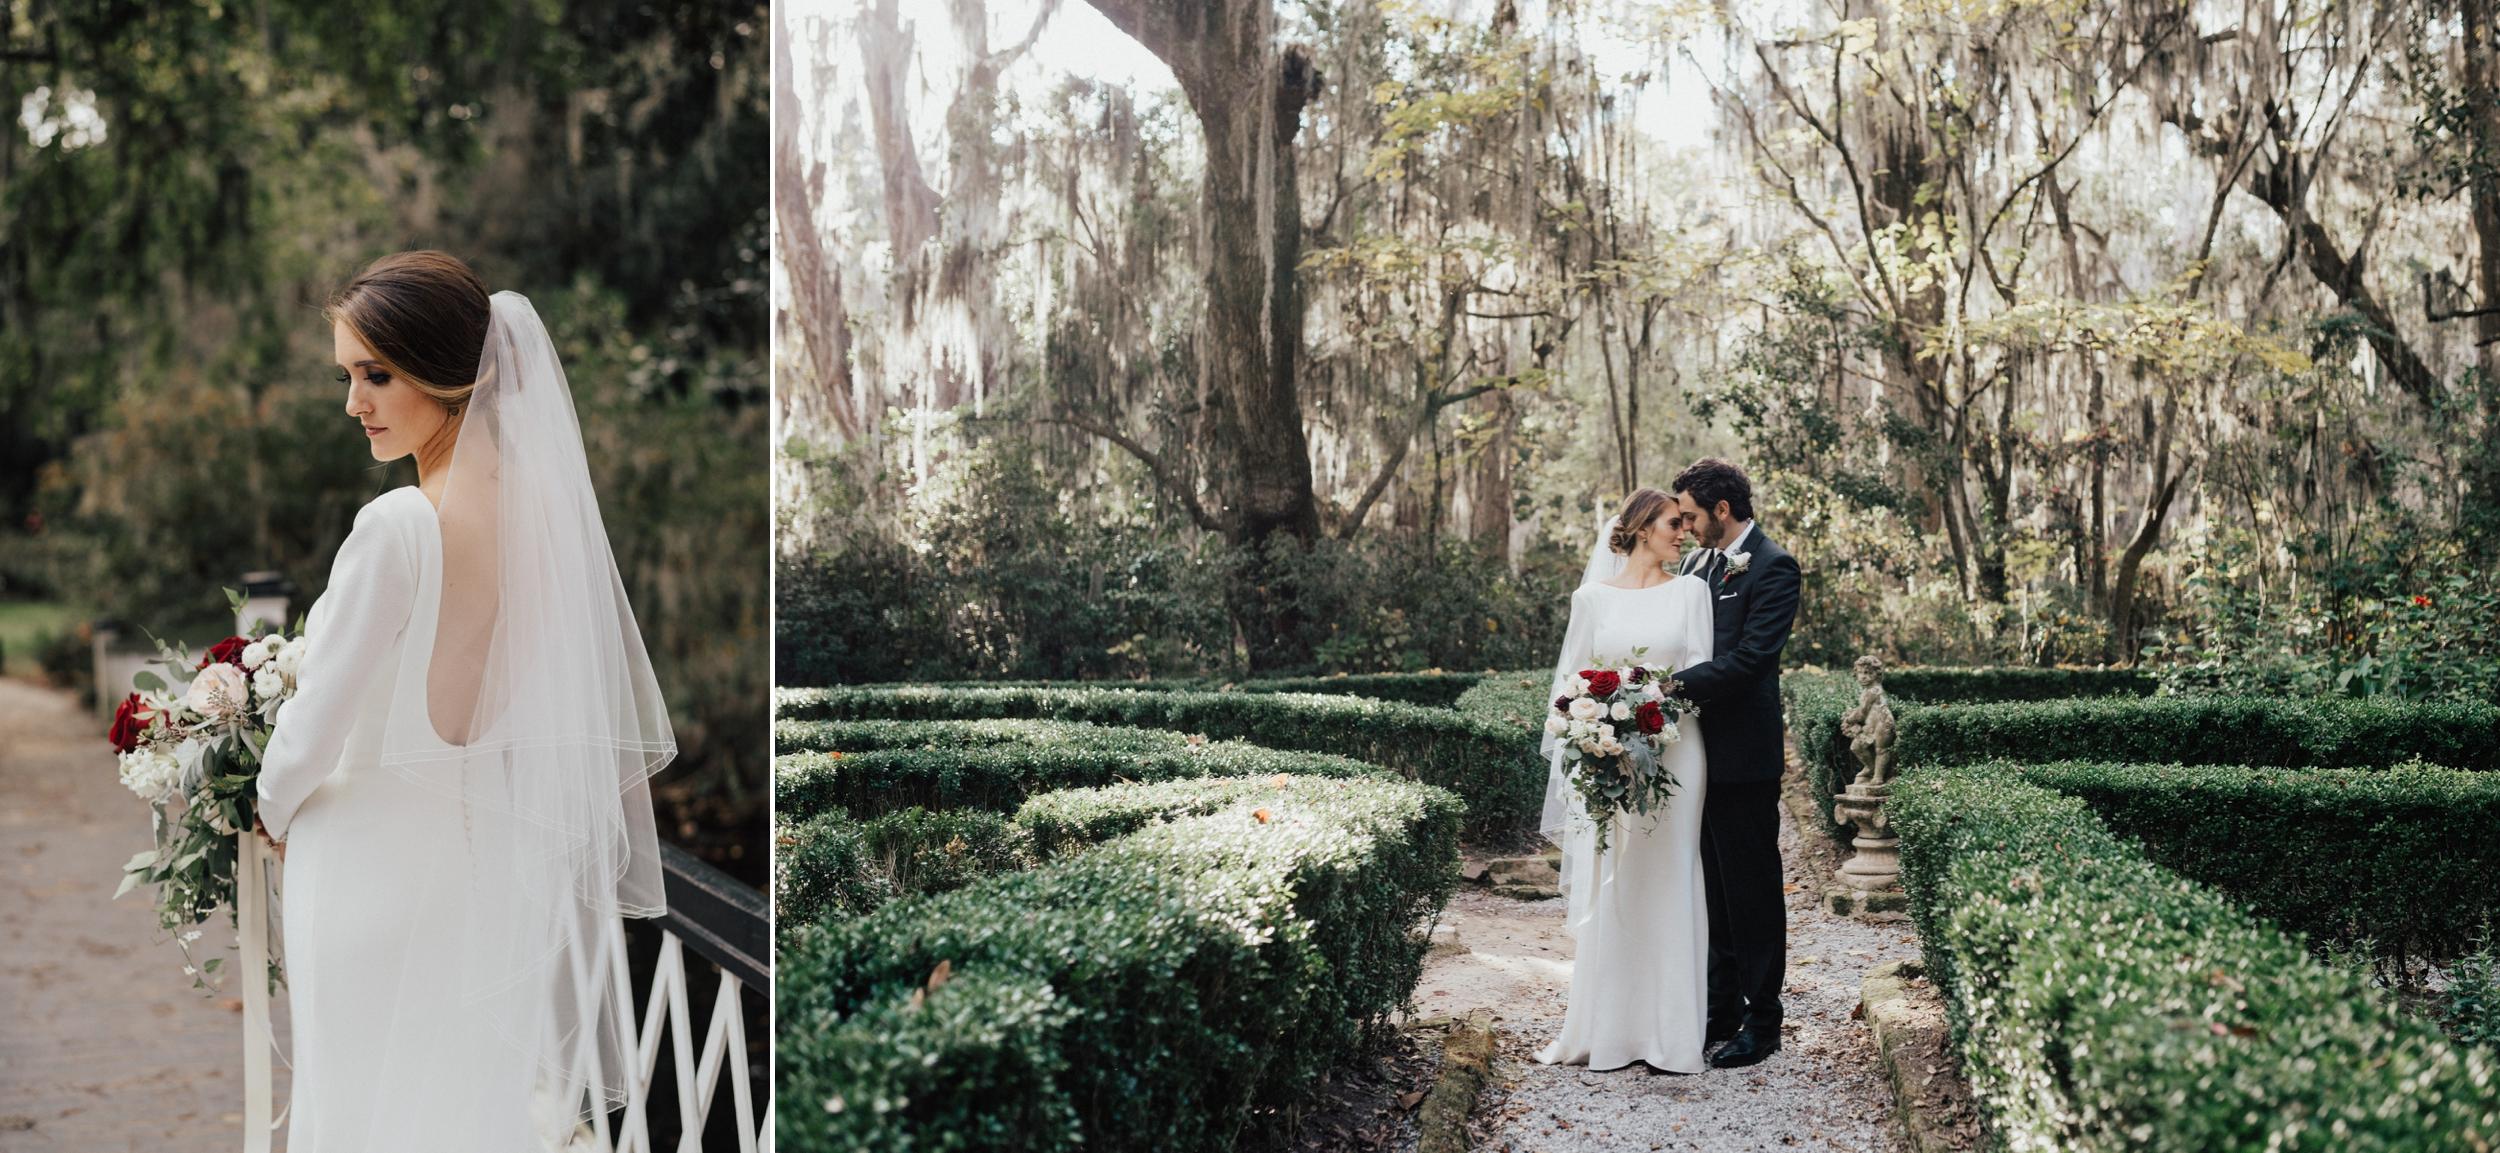 Charlestonweddingphotographer-30.jpg